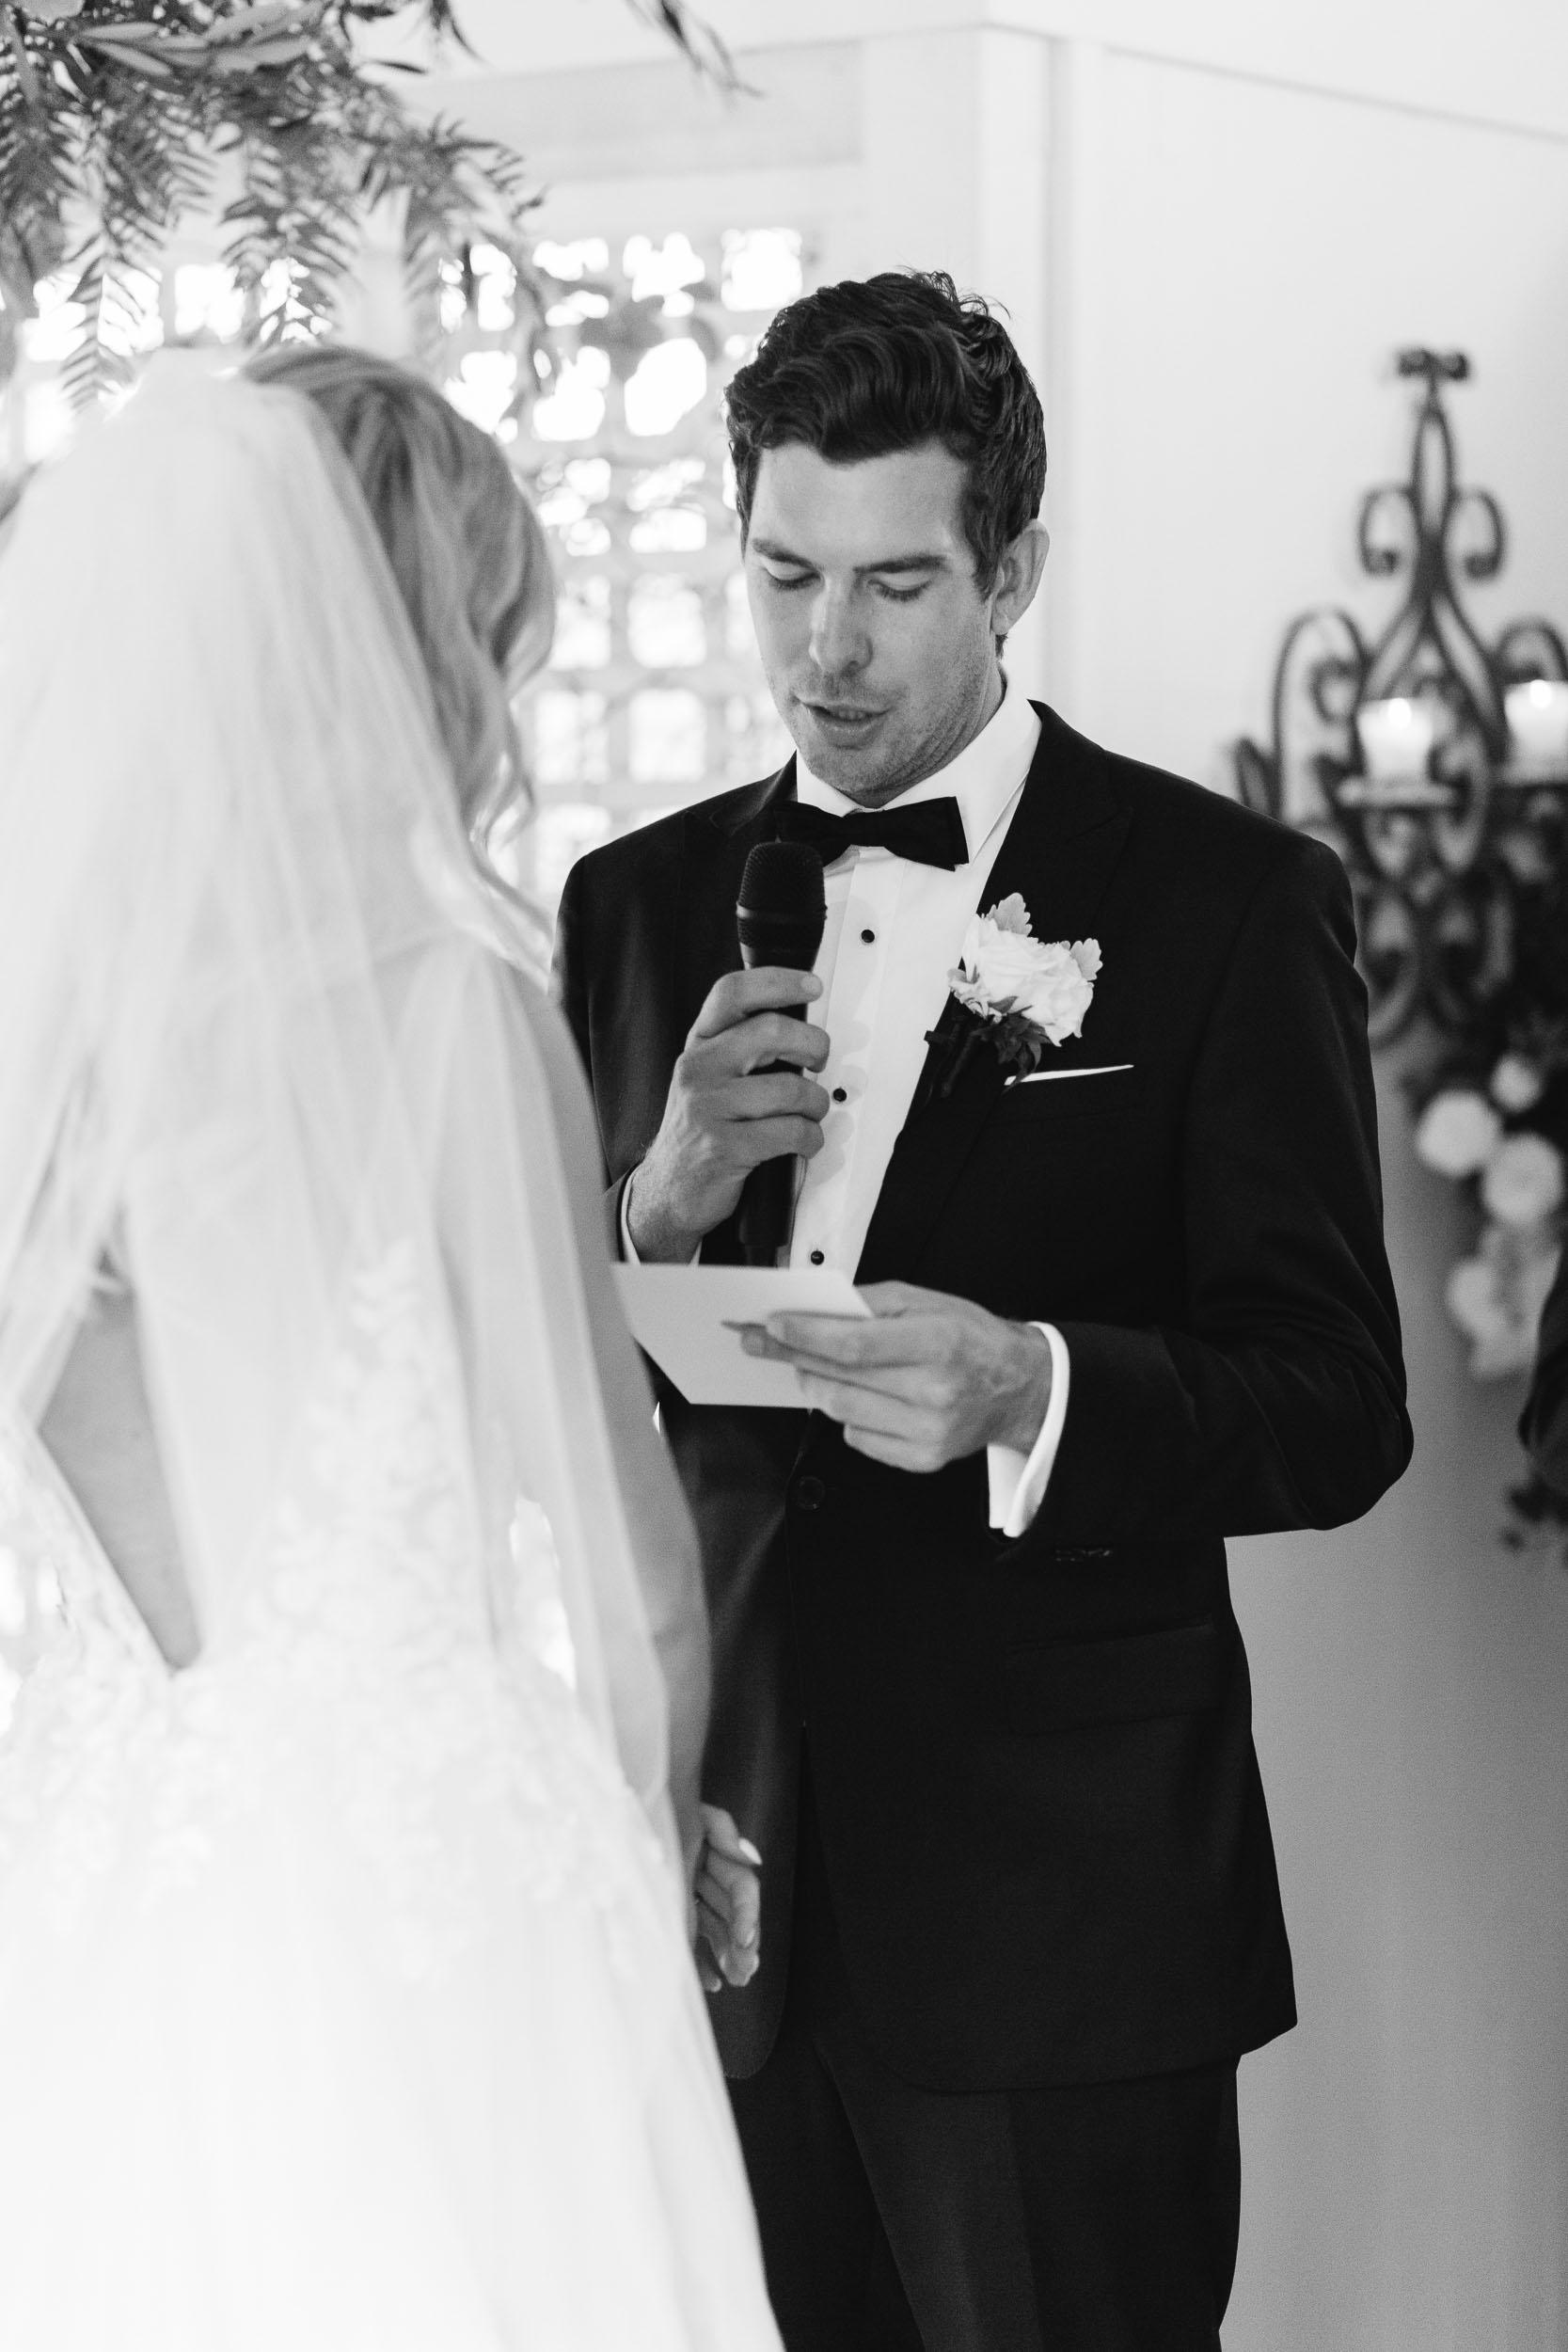 Kas-Richards-Mornington-Peninsula-Private-Property-Wedding-Marianna-Hardwick-Gown-262.jpg